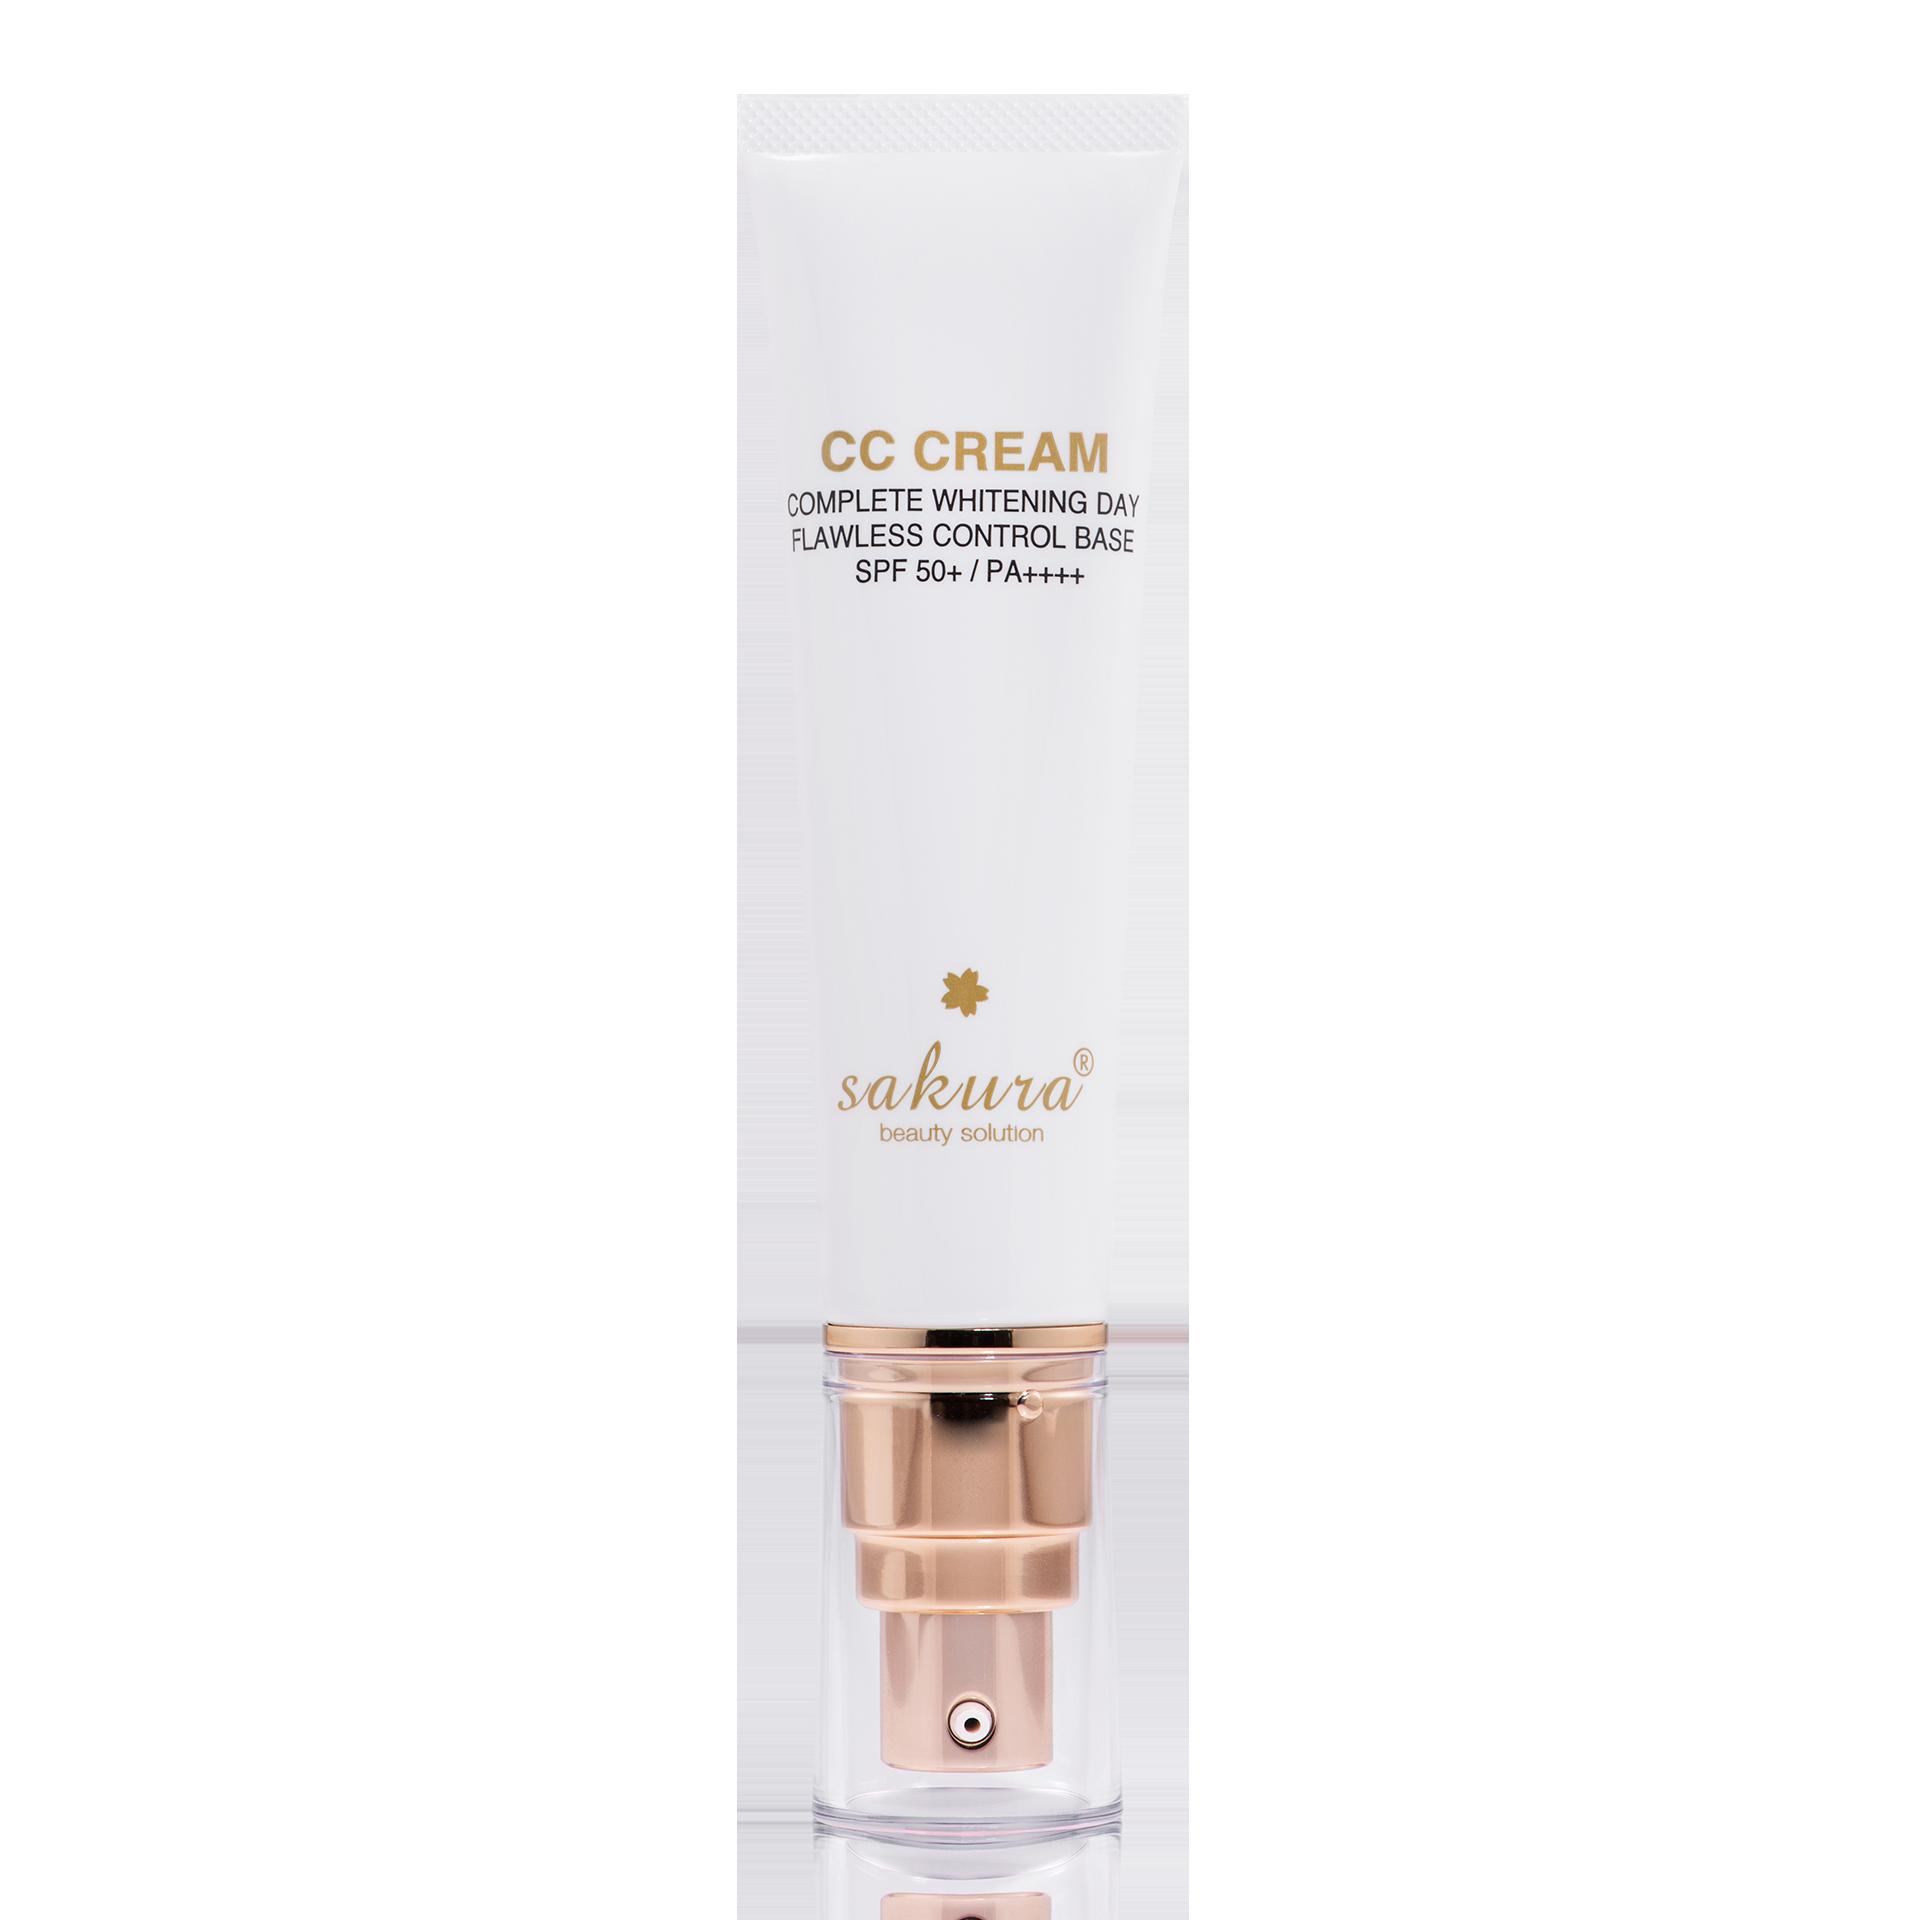 Sakura CC Cream Flawless Control Base